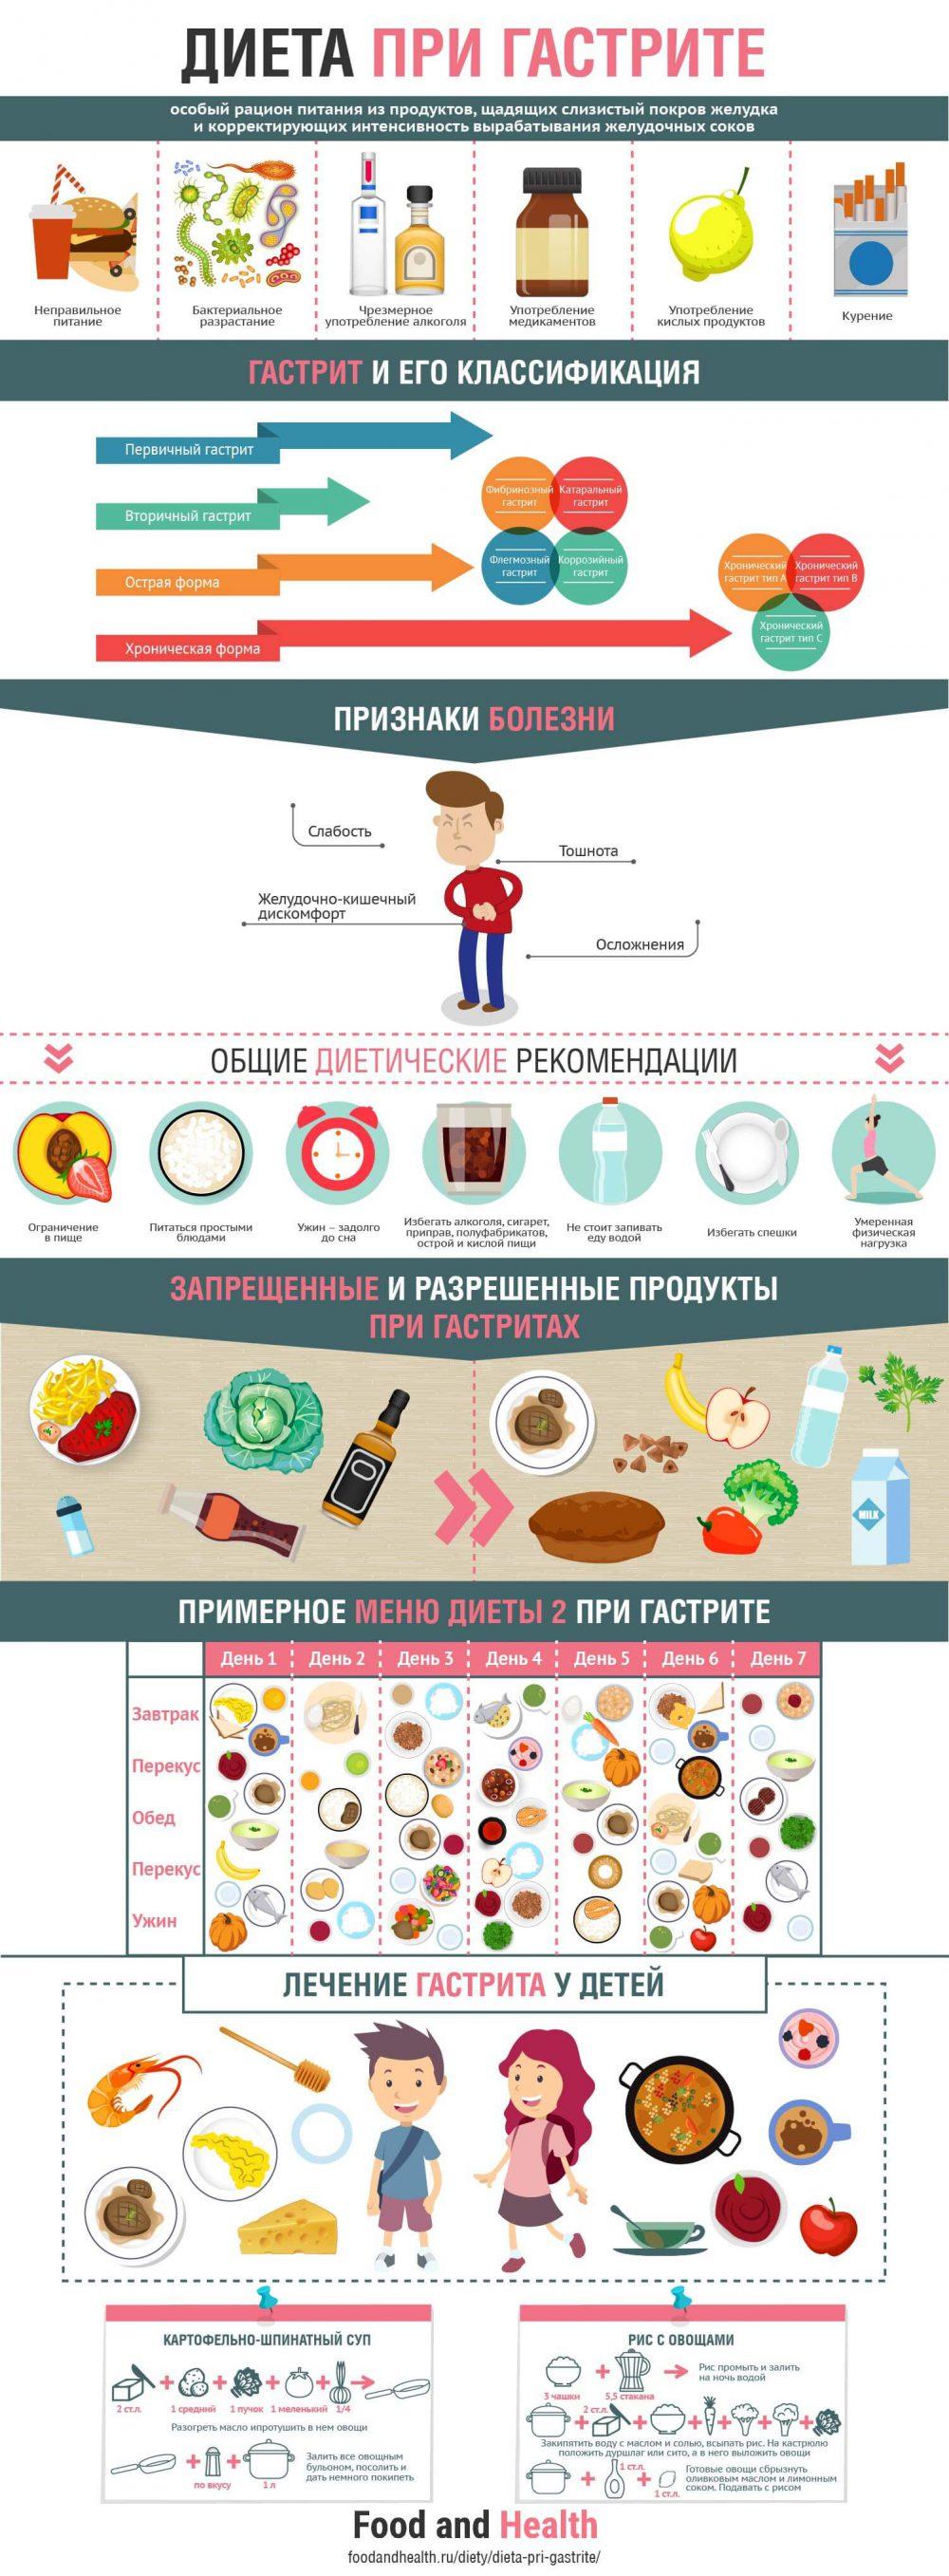 Диета при гастрите - инфографика